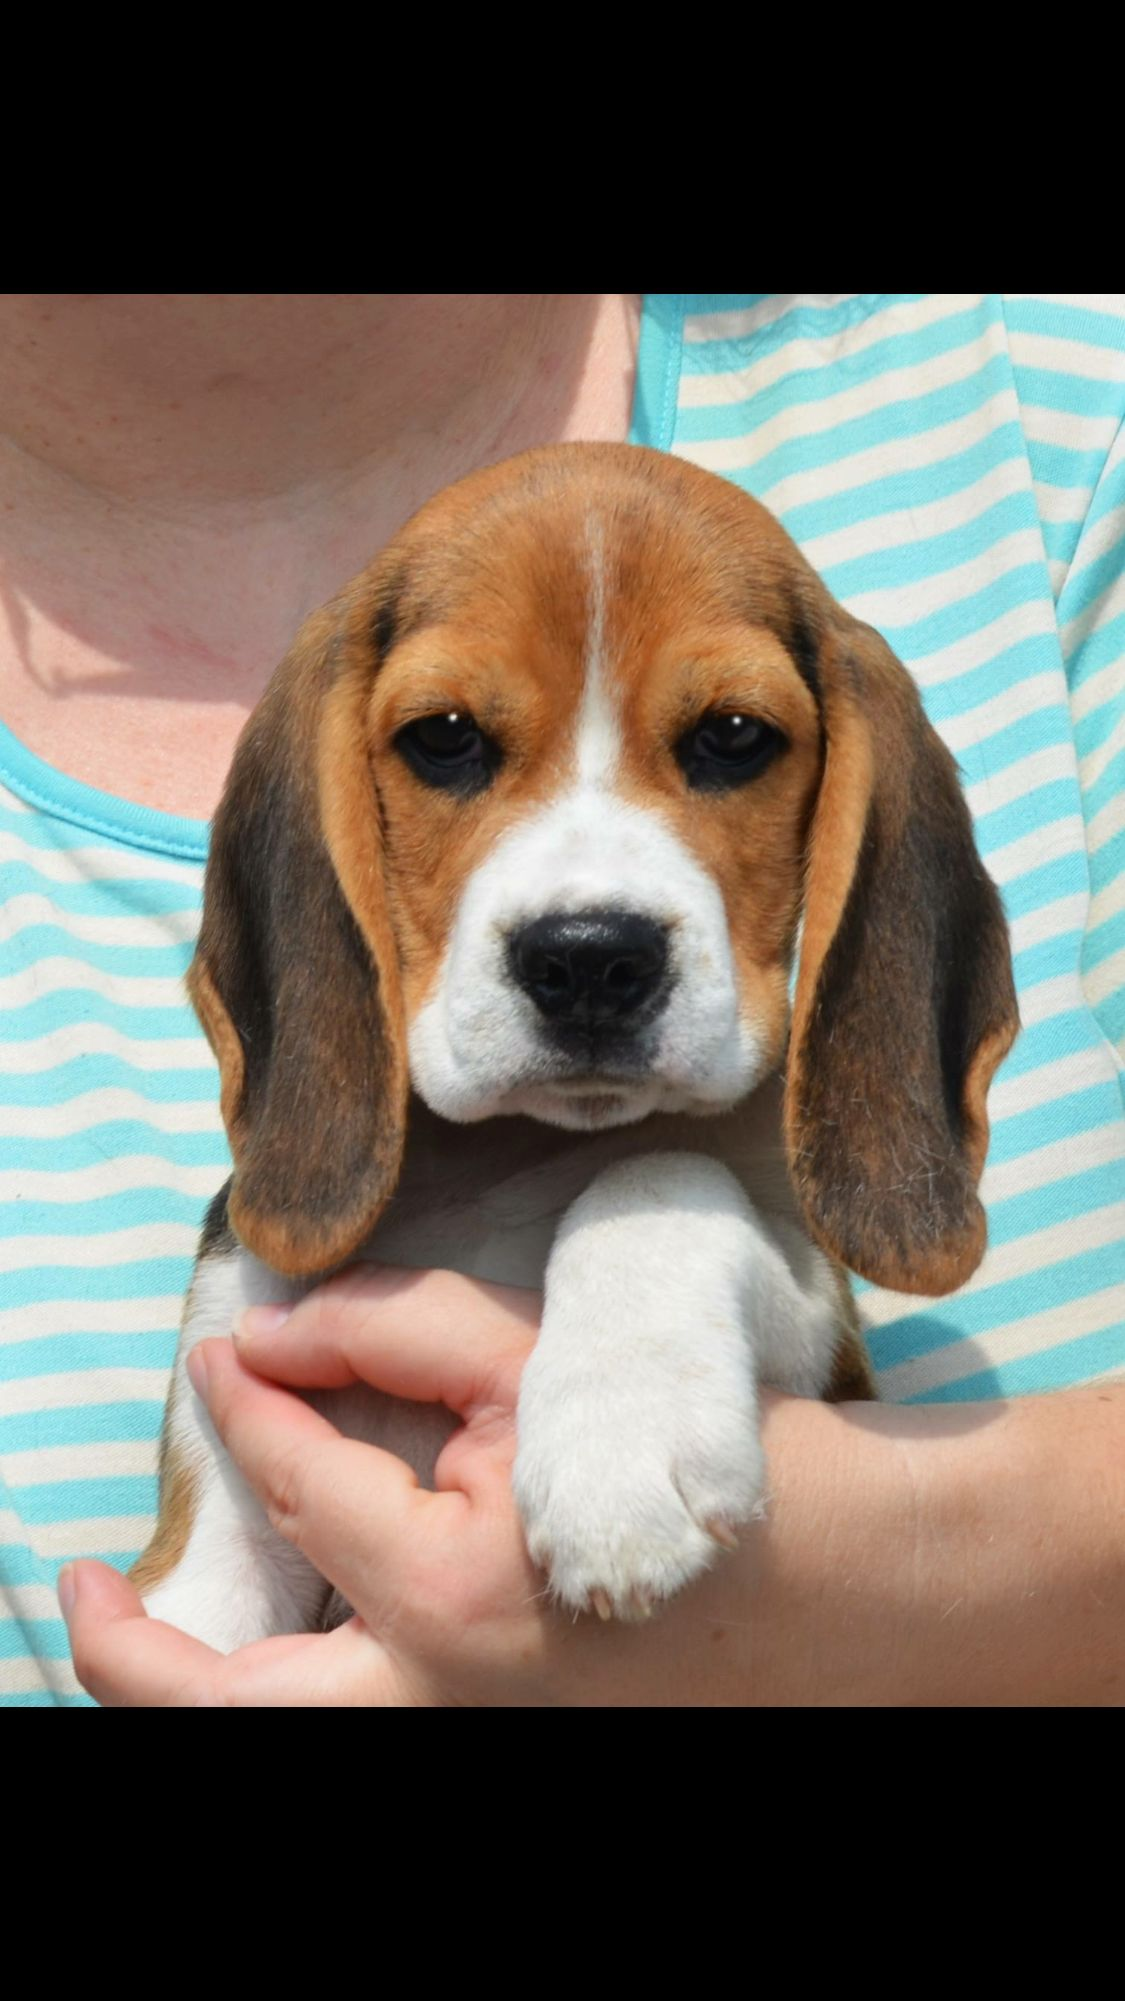 Precious Beagle puppy, Beagle, Puppies